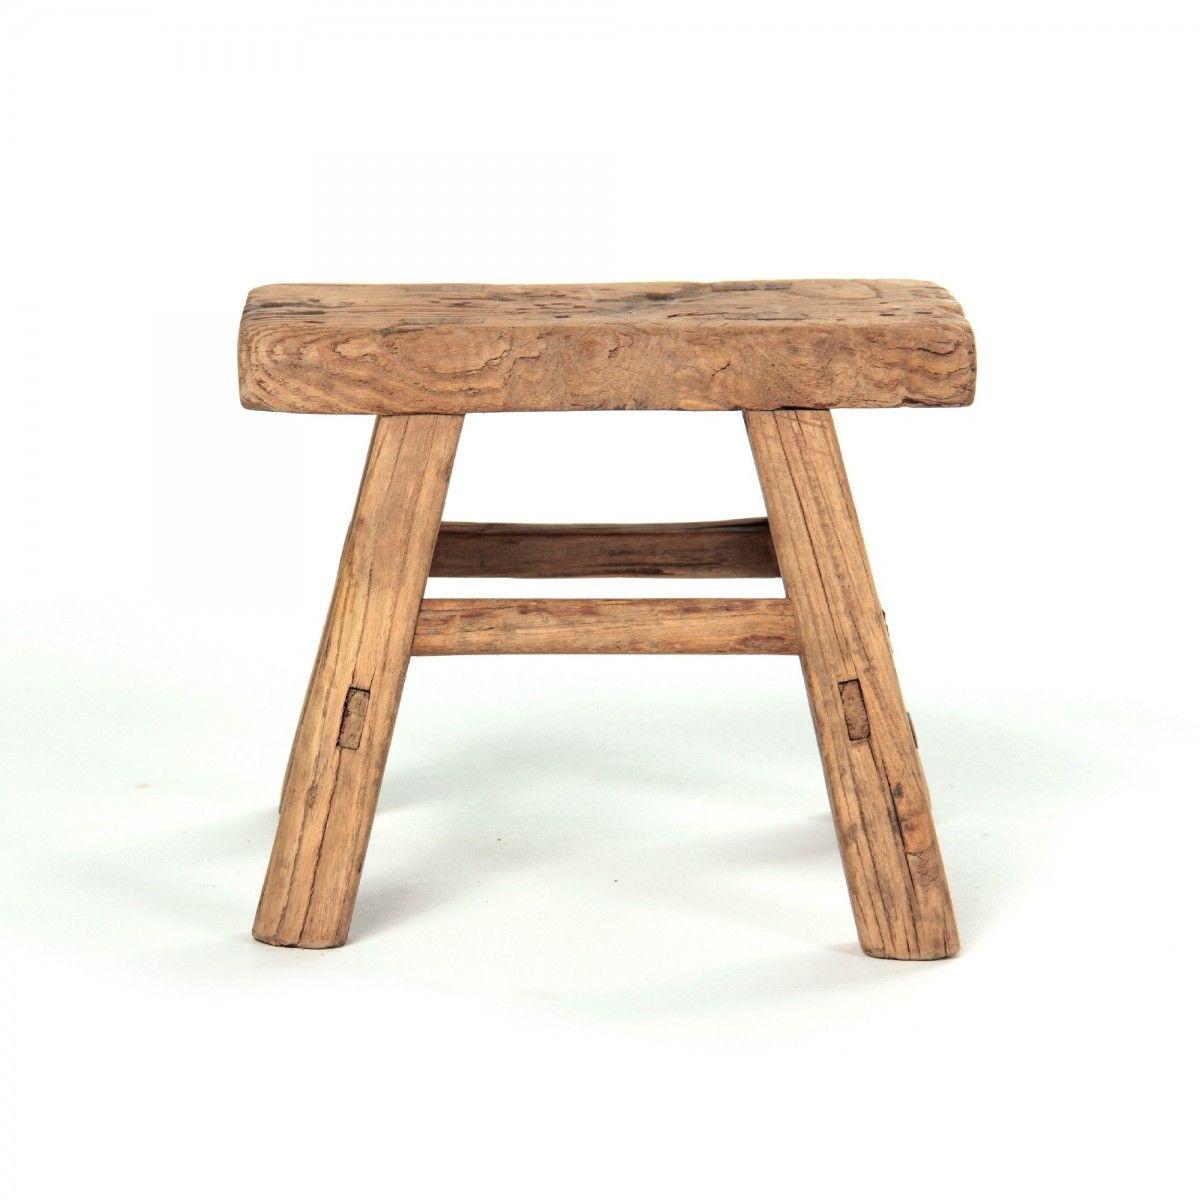 schemel aus altem holz natur l 12 cm b 28 cm h 21 cm kleines bad pinterest m bel. Black Bedroom Furniture Sets. Home Design Ideas